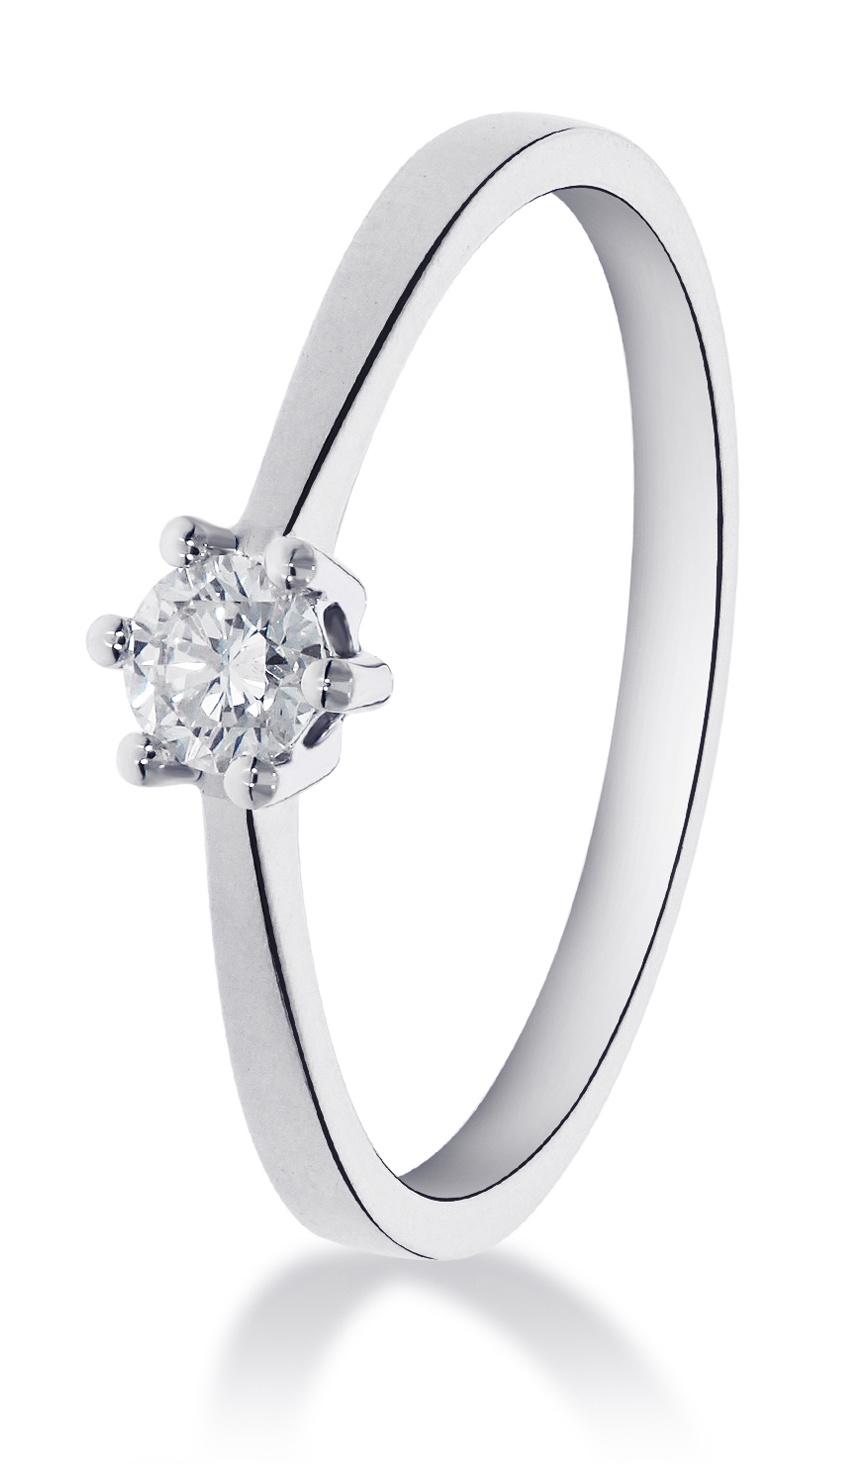 14 karaat witgouden ring met 1 diamant 0.10 crt. - Solitair - Witgoud-1